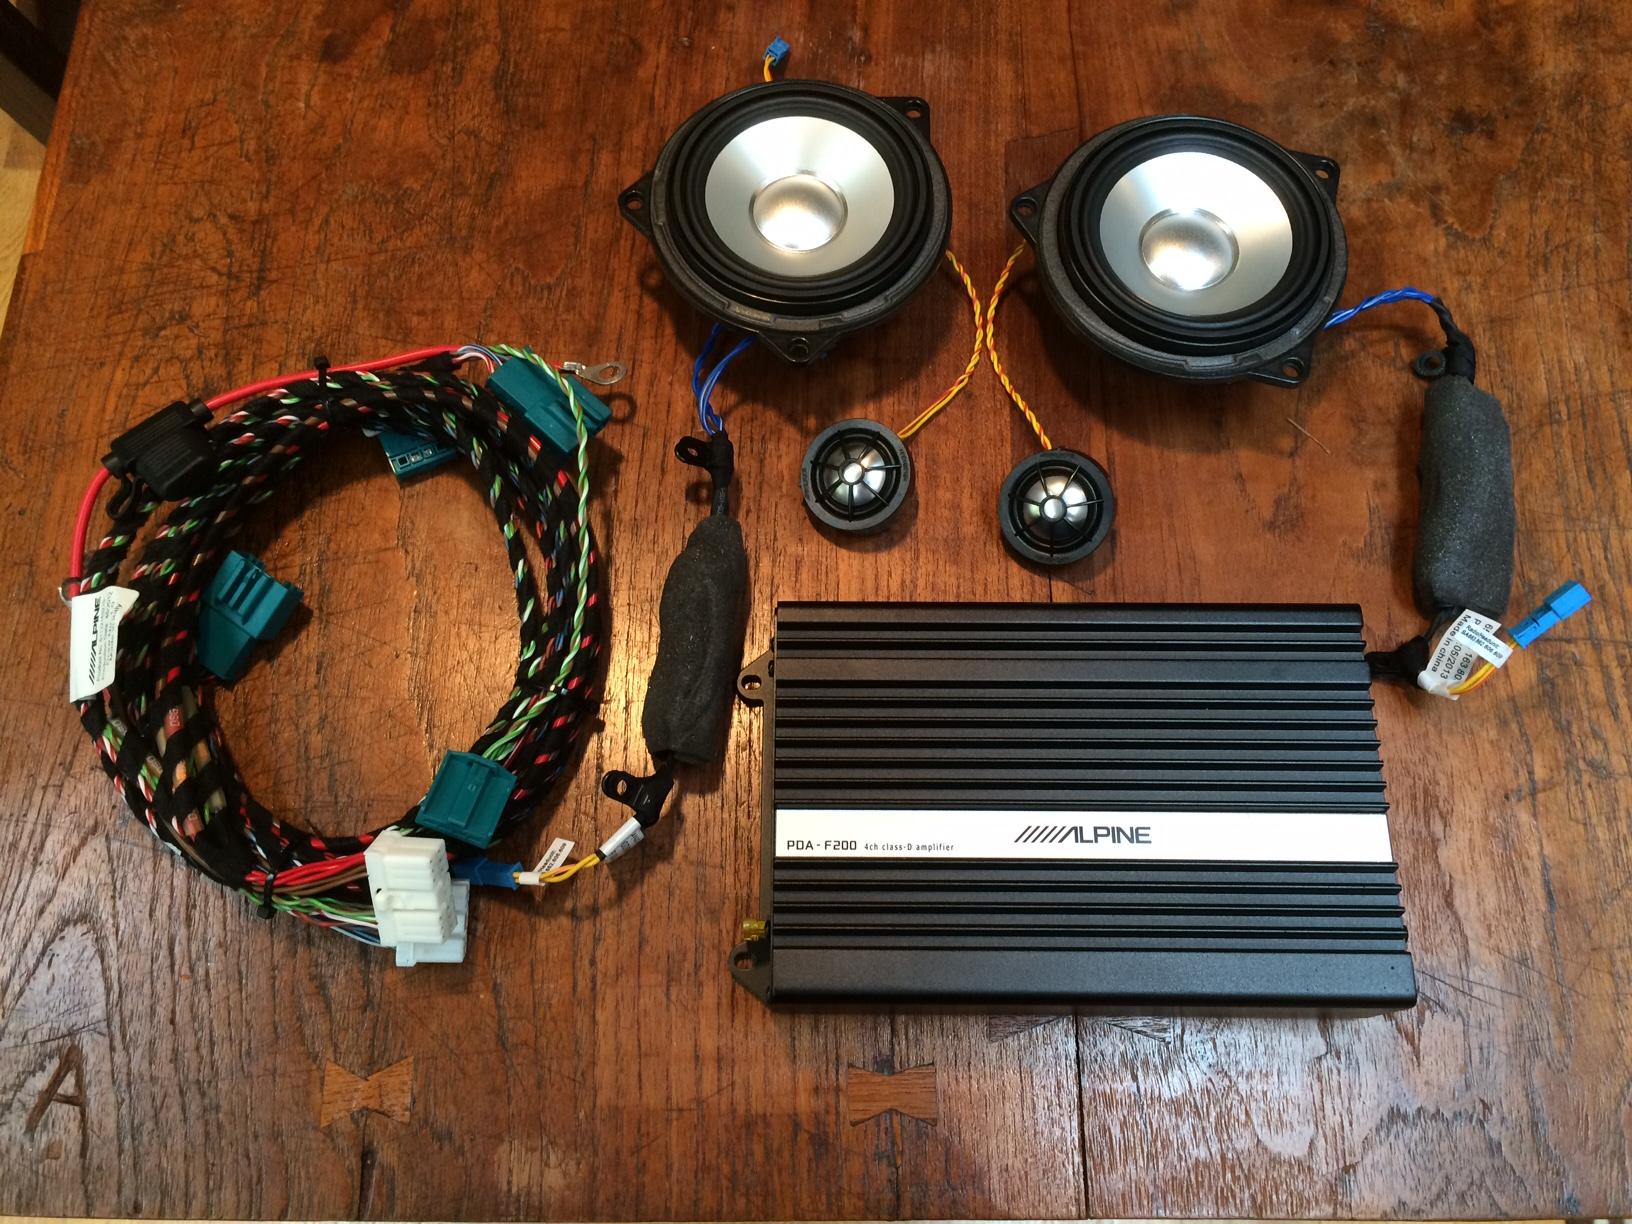 sold - alpine hifi stereo retrofit kit